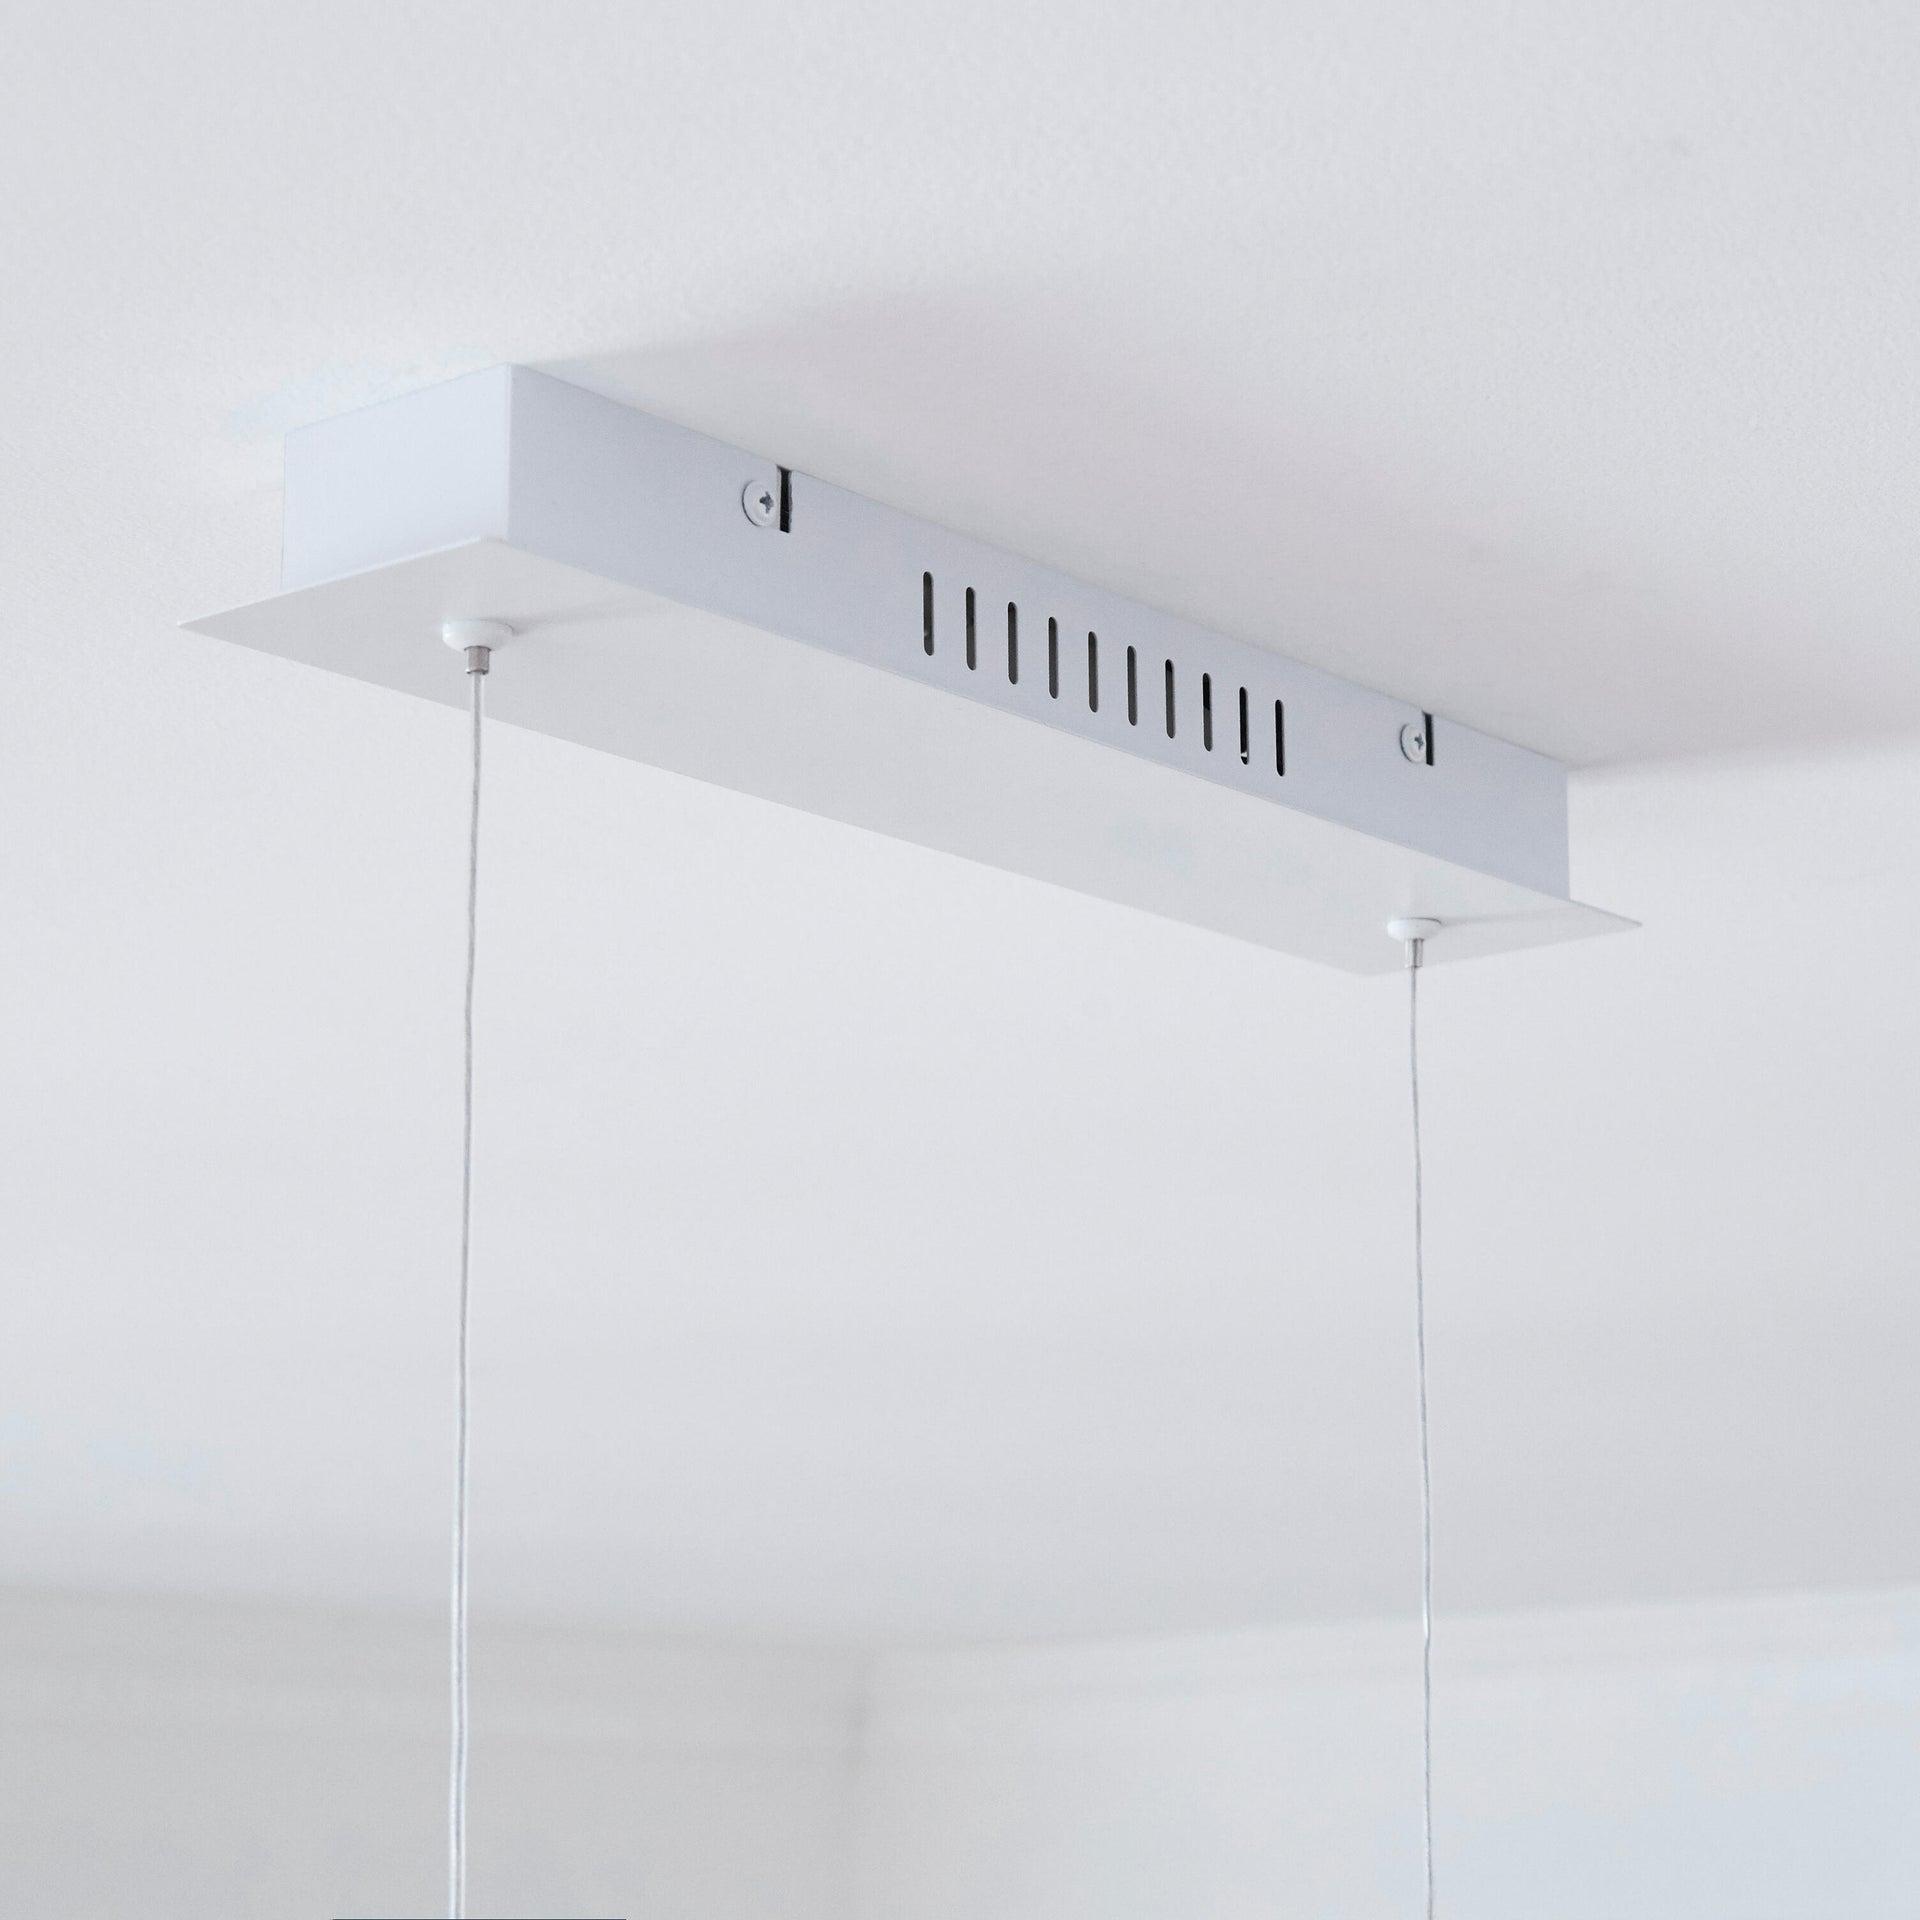 Lampadario Scandinavo Namu LED integrato legno, in legno, L. 118 cm, INSPIRE - 2